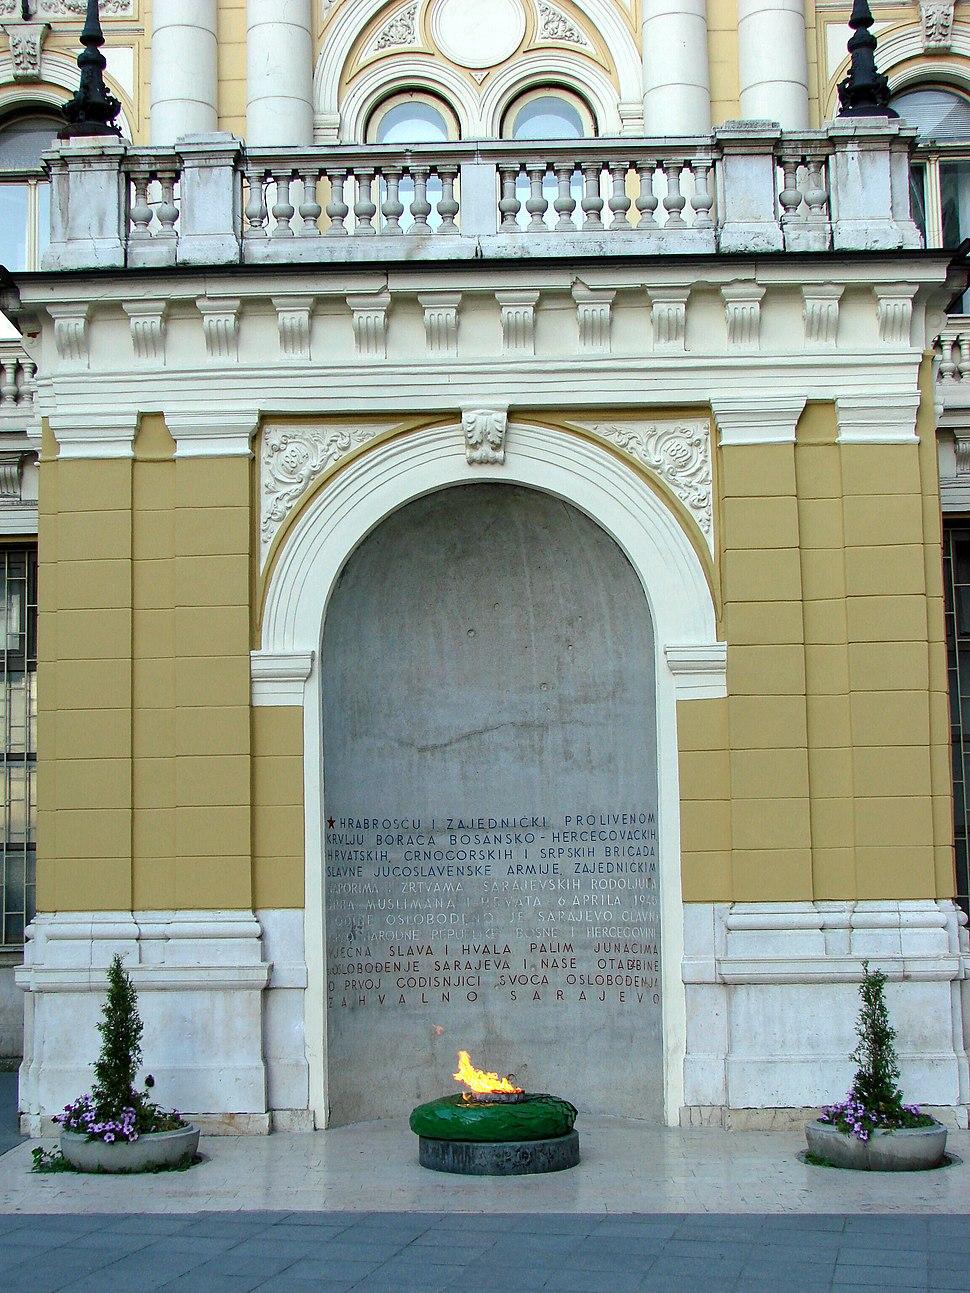 Sarajevo - Bosnia - War Memorial